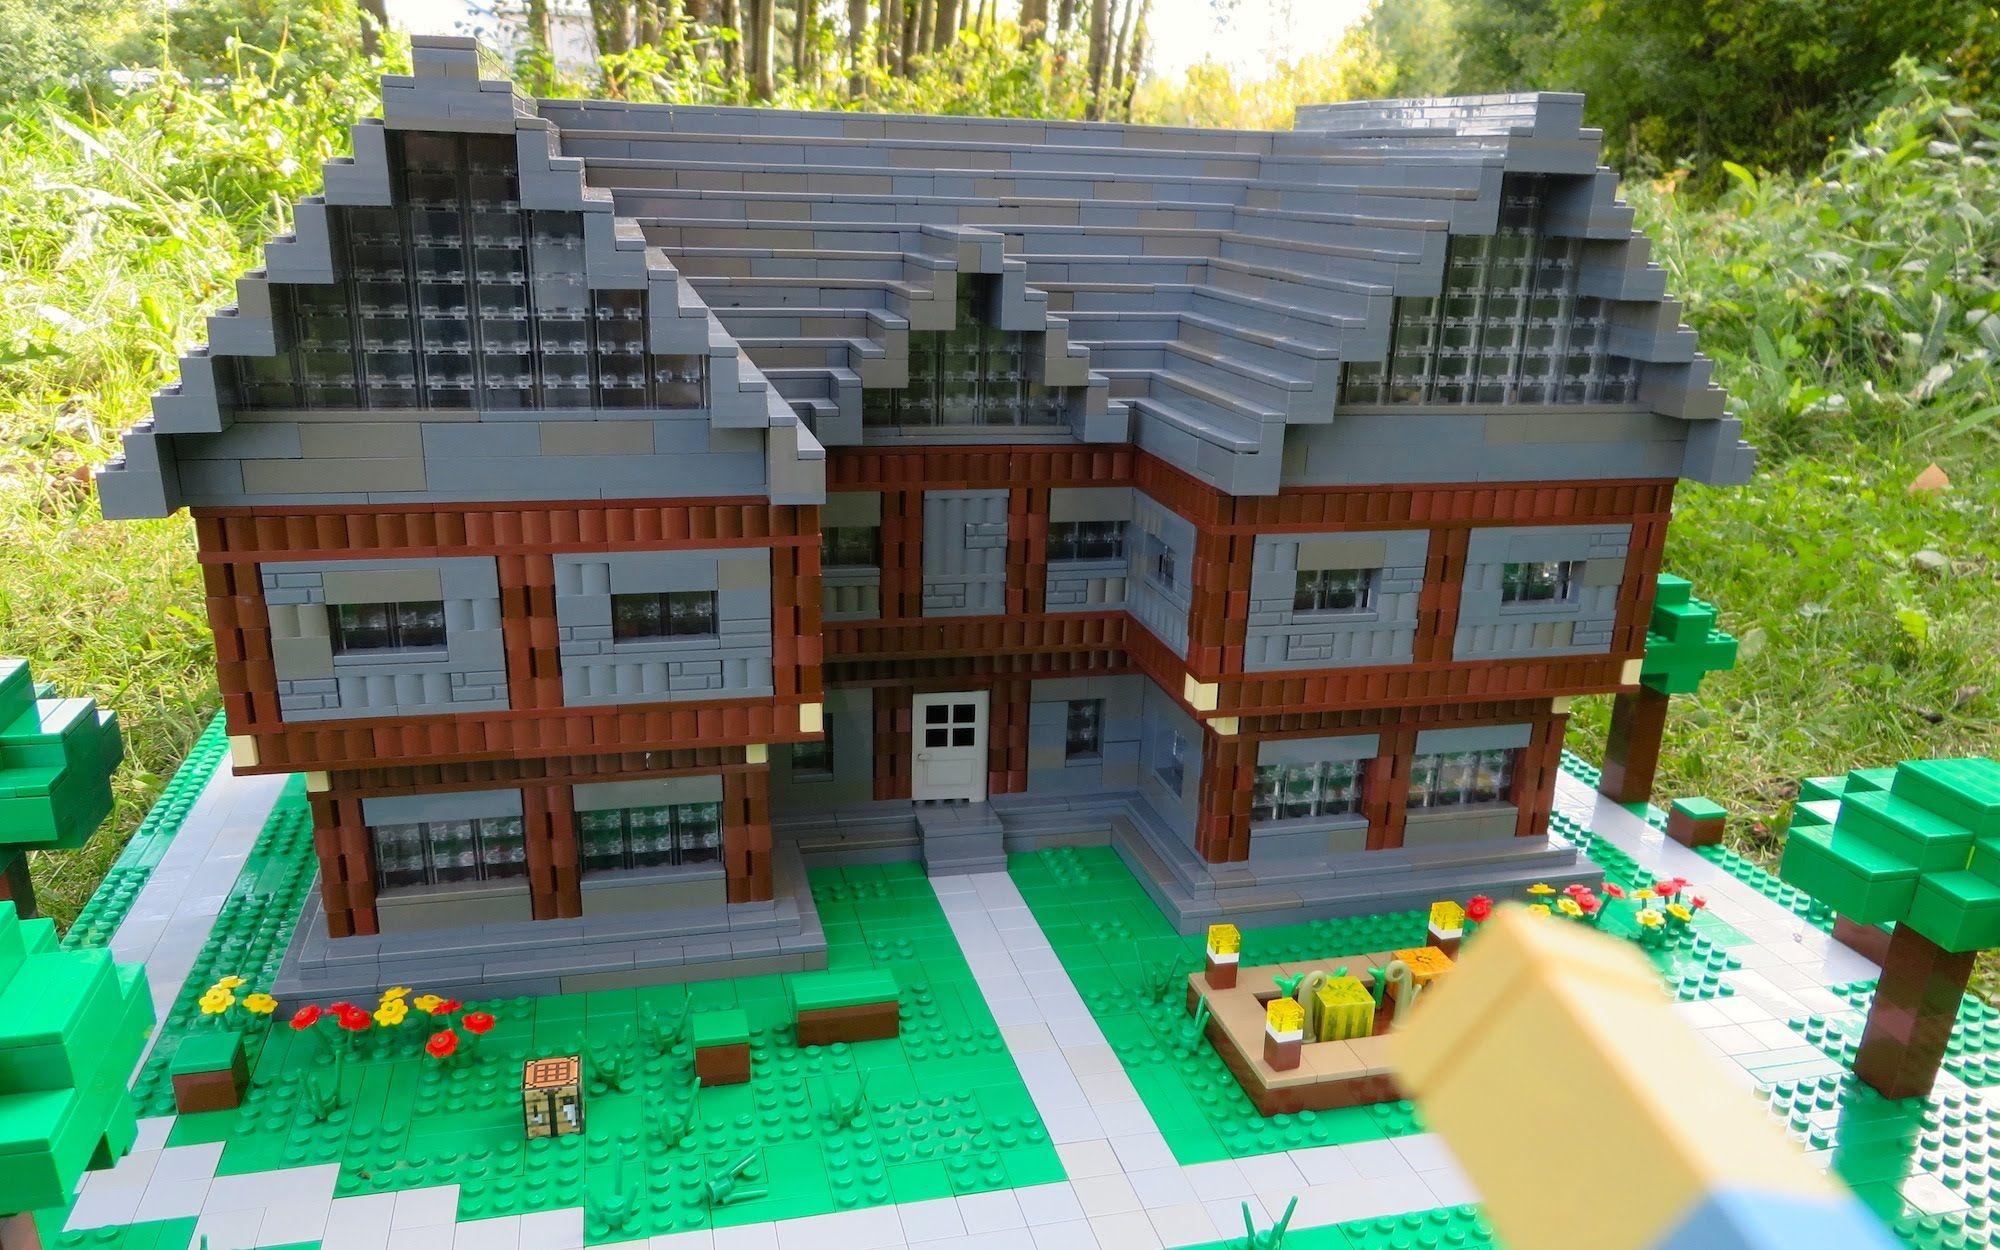 Lego Minecraft Steve S House In 2020 Lego Mansion Lego Minecraft Lego